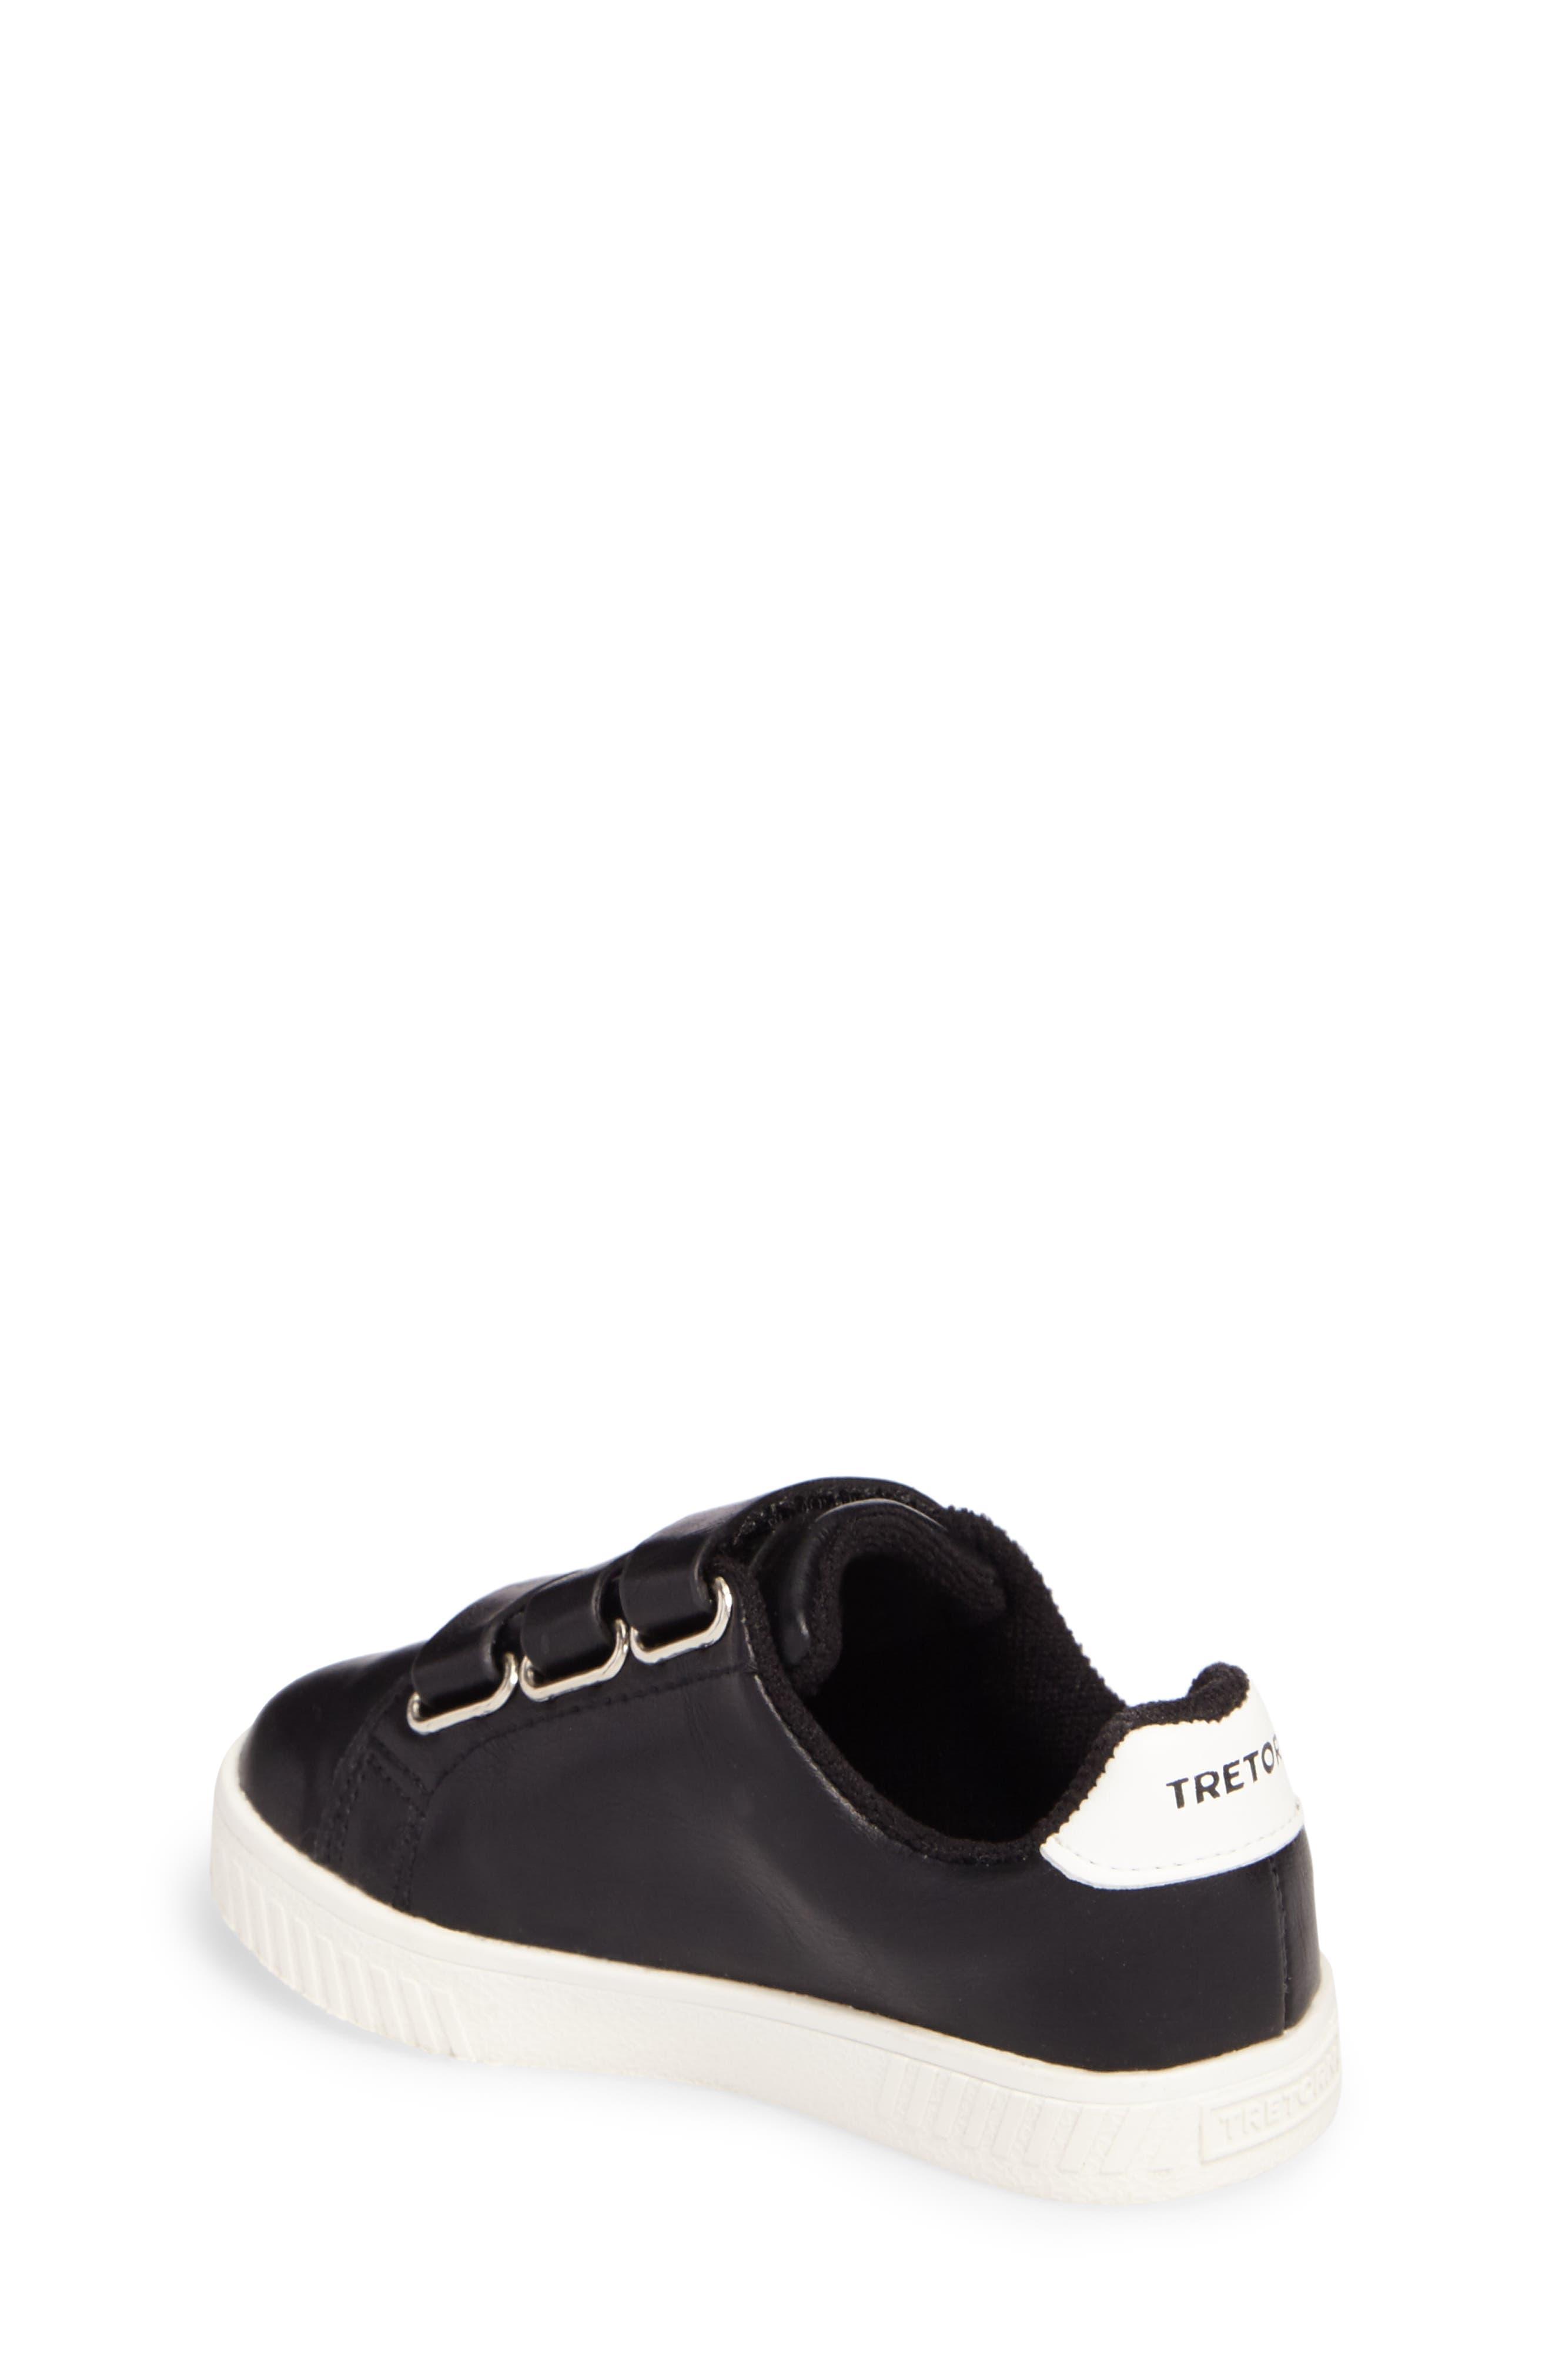 Camden Carry Sneaker,                             Alternate thumbnail 2, color,                             005